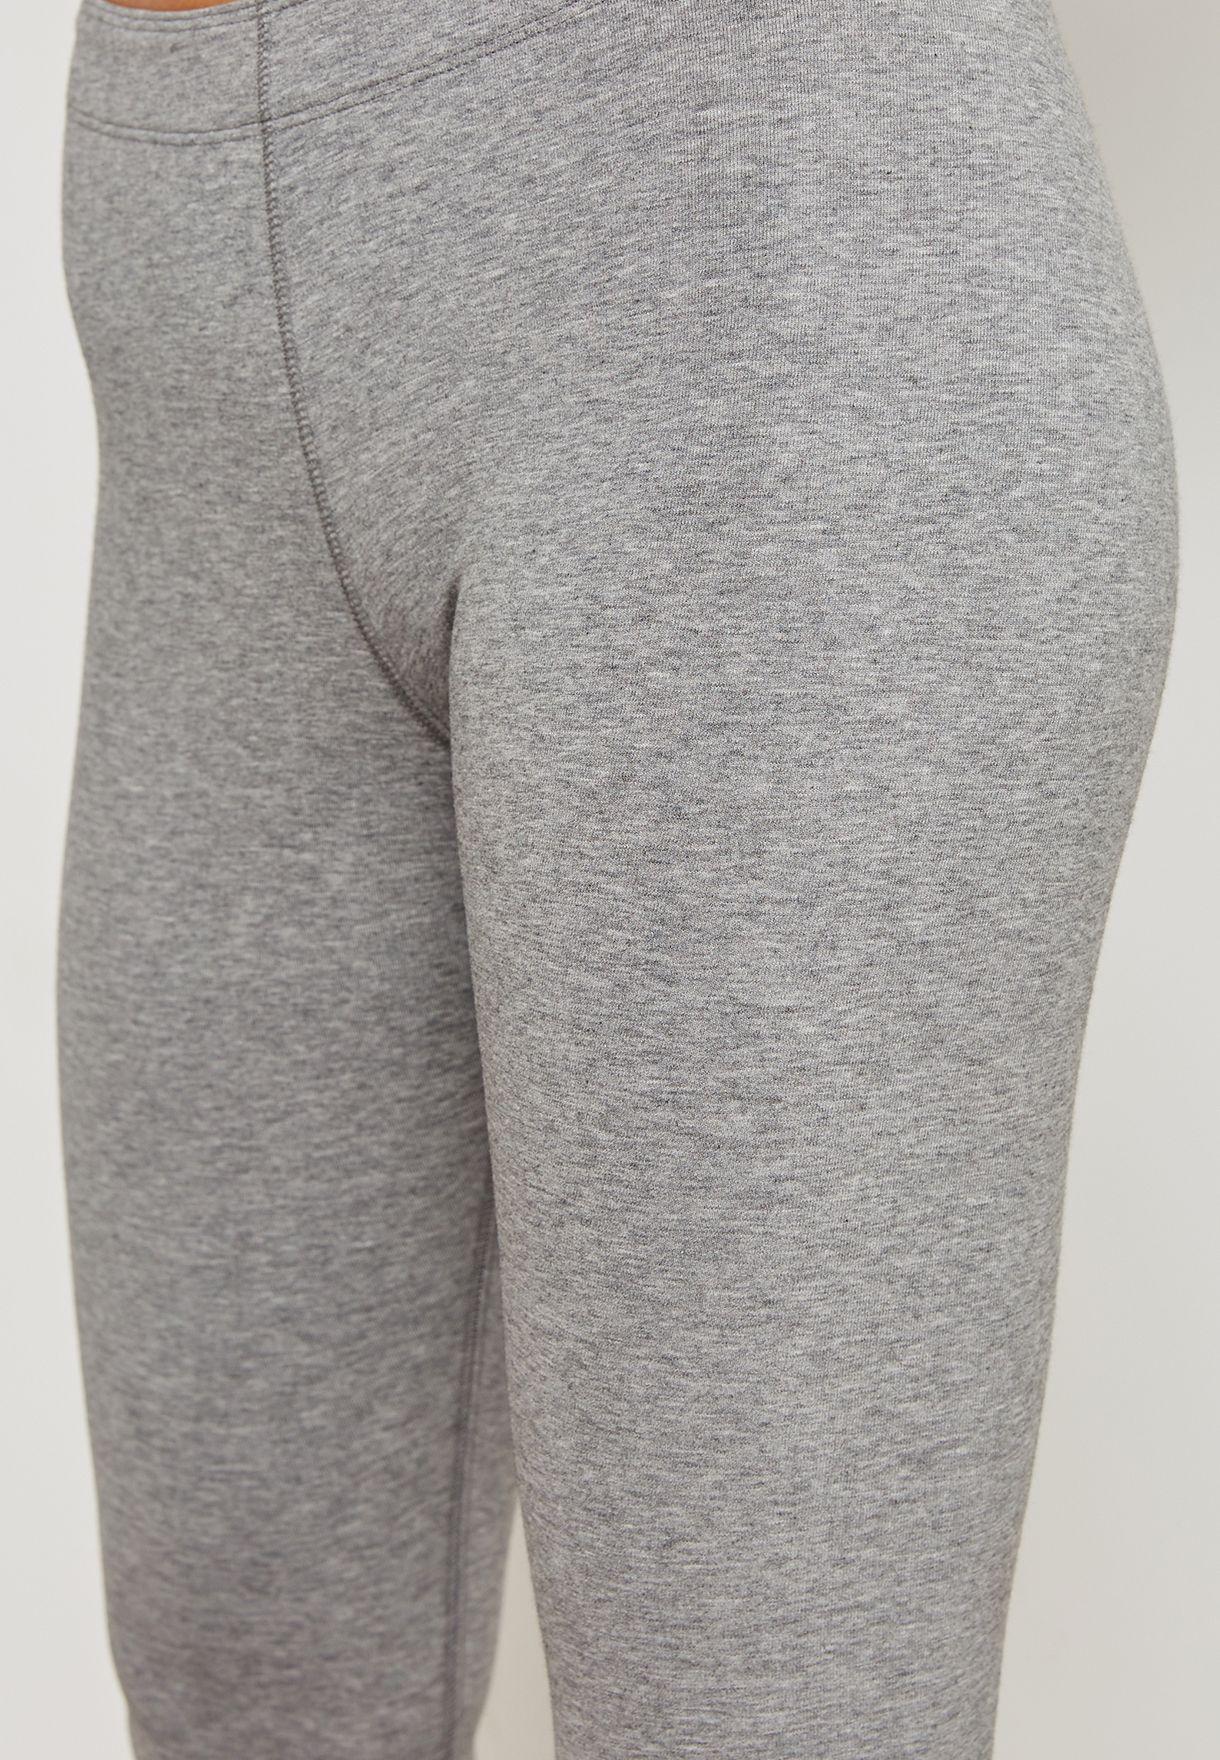 79fef0f50a6341 Shop Nike grey Leg-A-See Cropped Leggings AH2004-091 for Women in ...